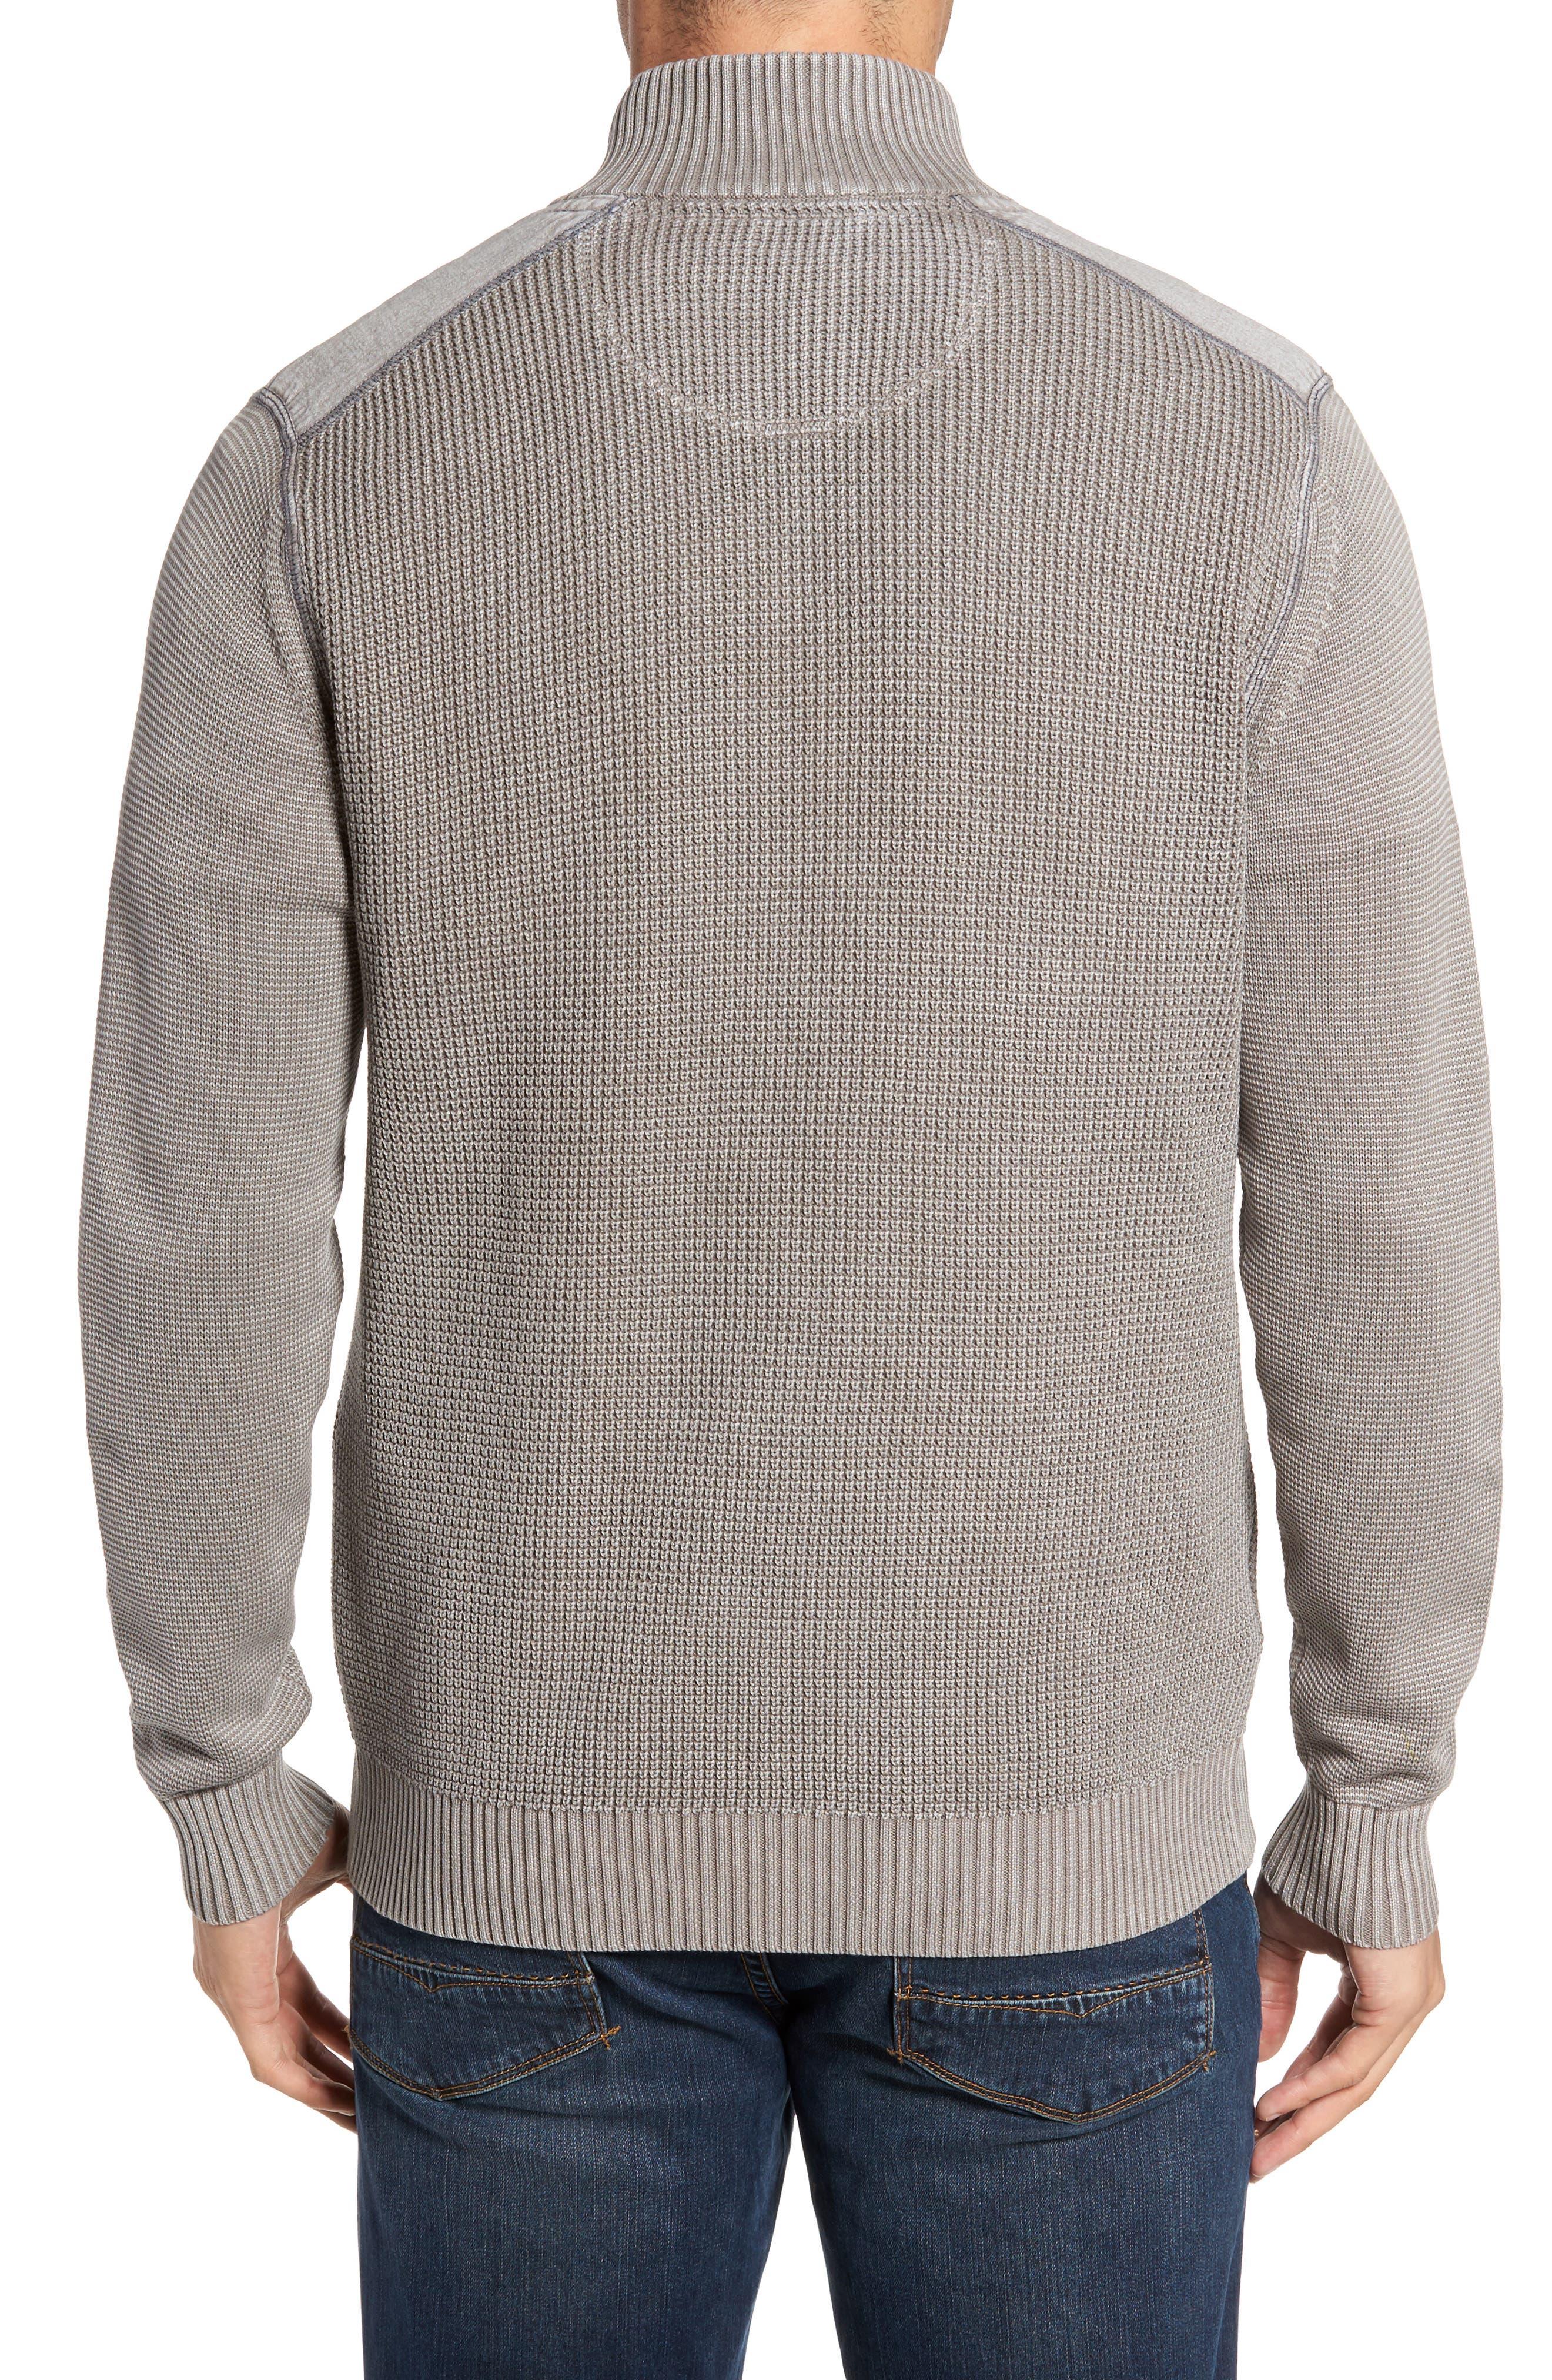 Coastal Shores Quarter Zip Sweater,                             Alternate thumbnail 8, color,